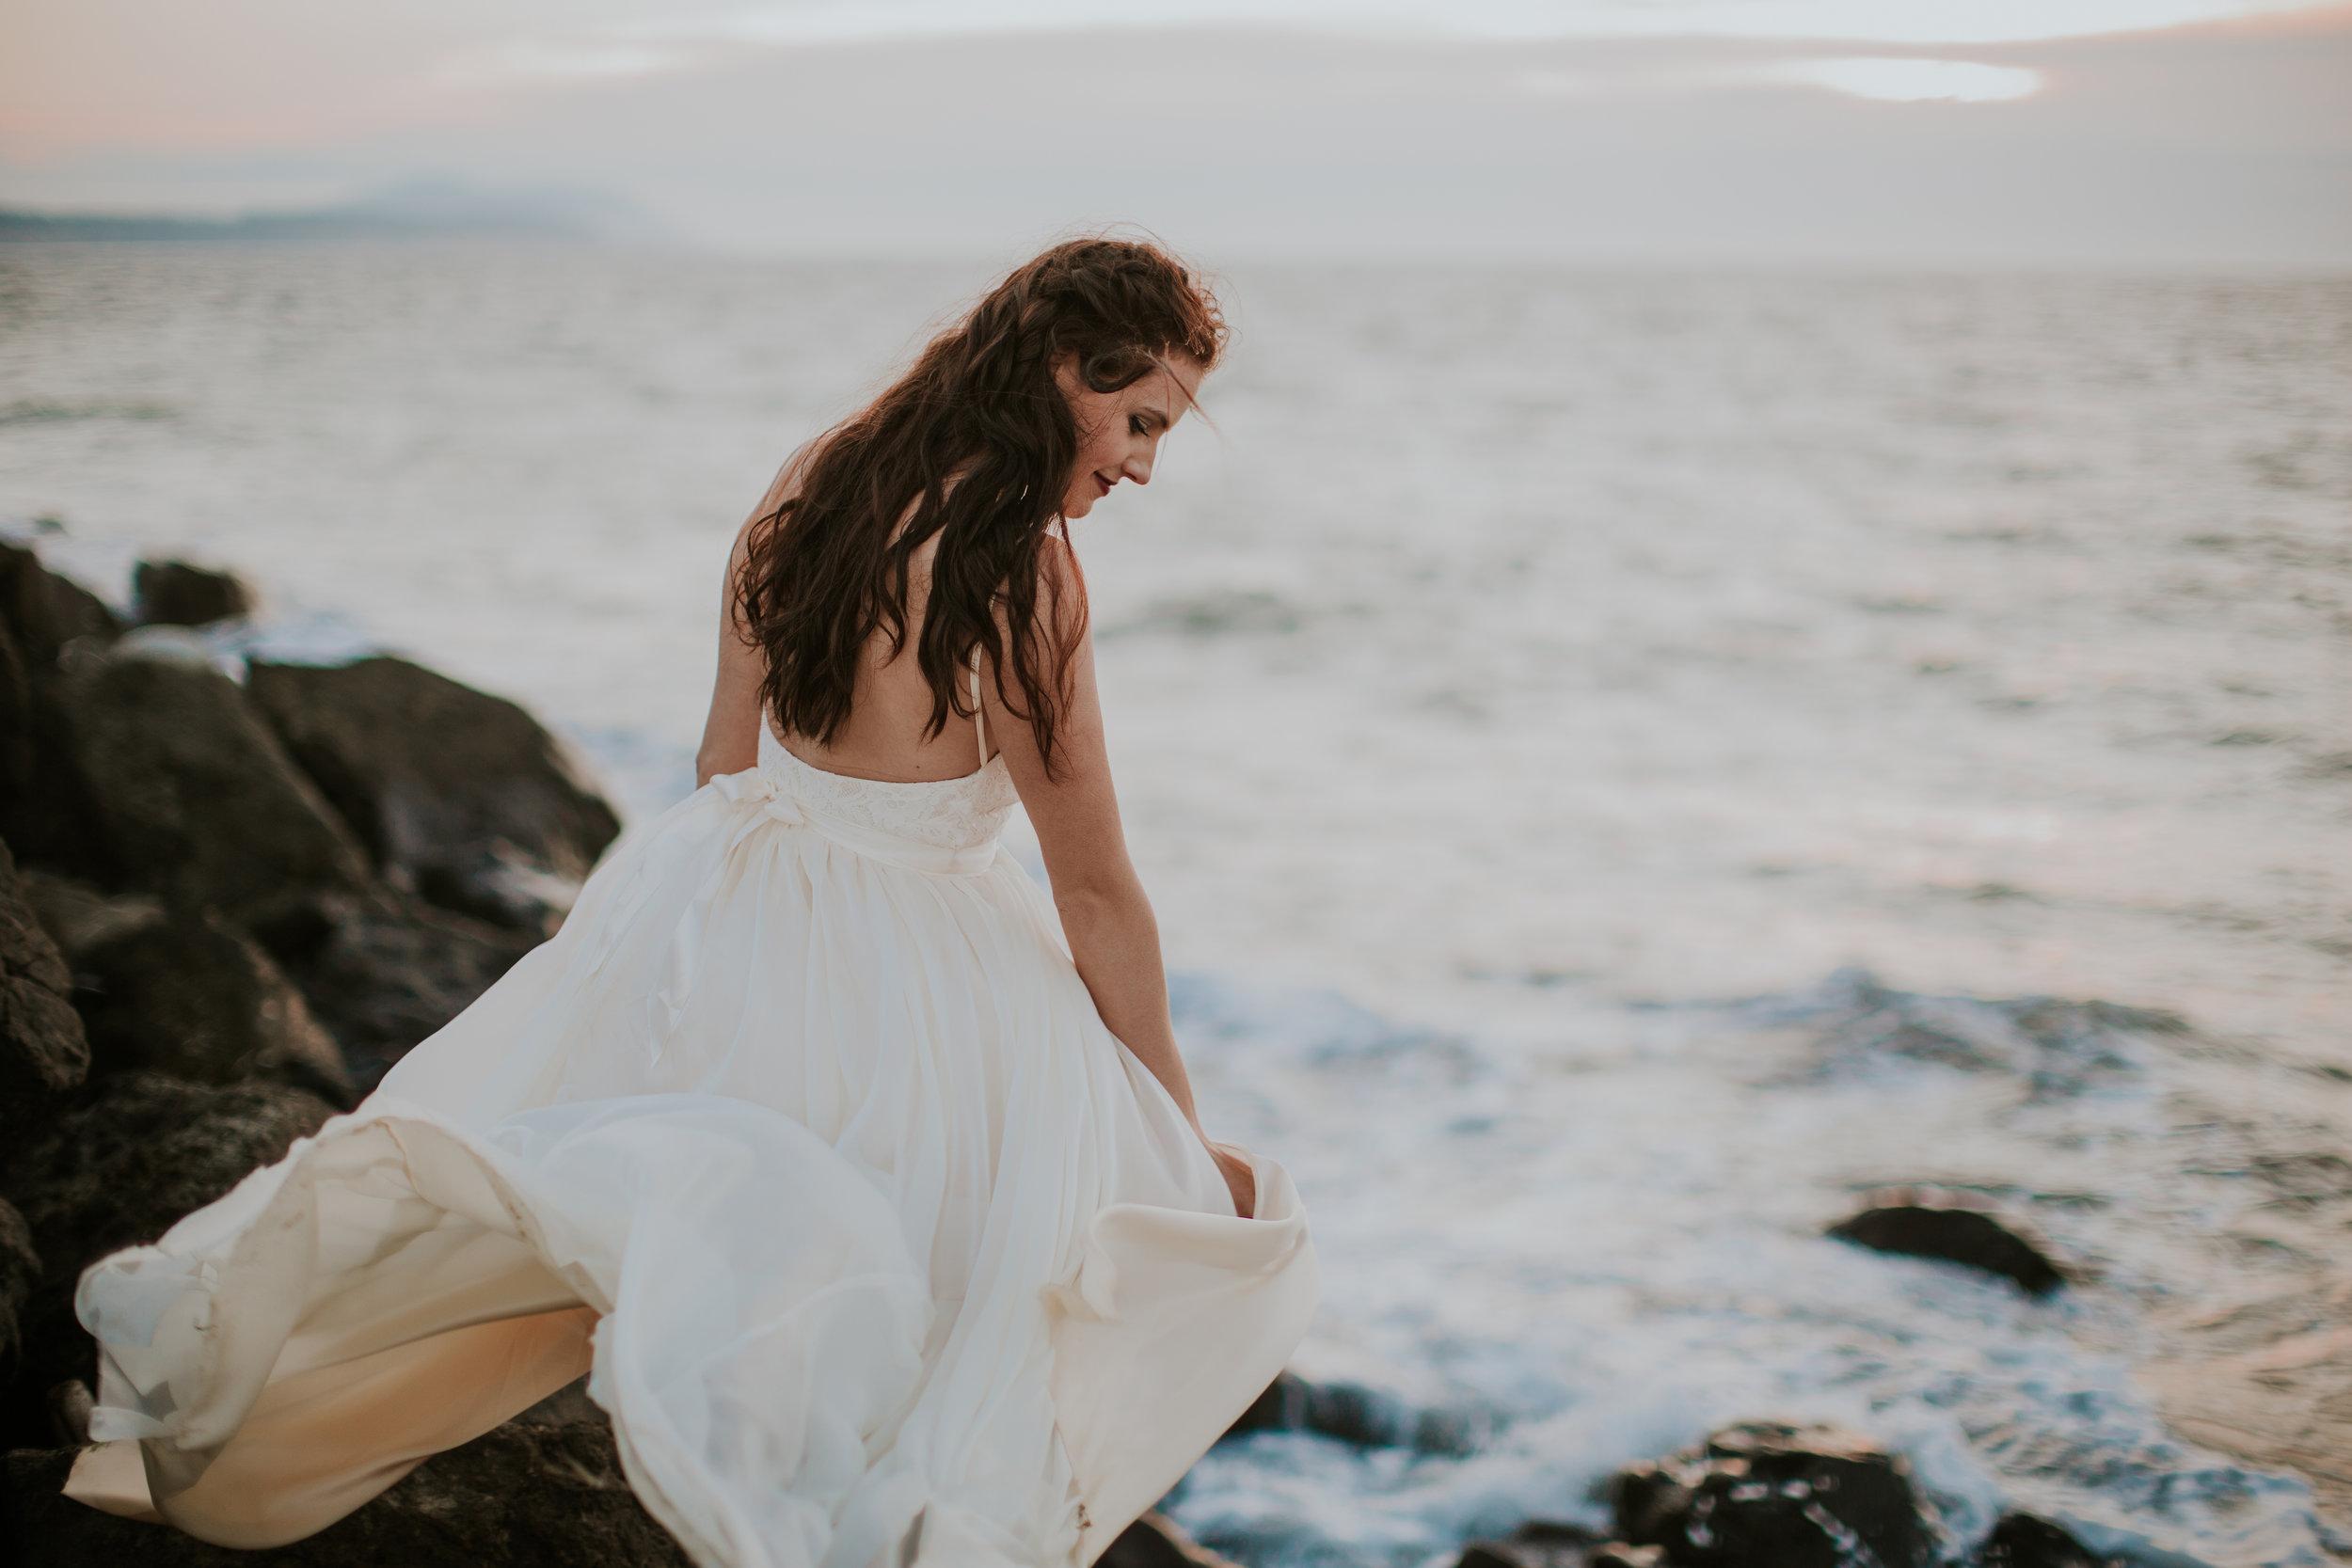 Port-Angeles-Photographer-Olympic-Peninsula-Wedding-Ediz-Hook-bride-dress-Kayla-Dawn-Photography-Olympic-Peninsula-PNW-Photographer-Portrait-Portraiture-Natural-Golden-Hour-Beach (2).jpg